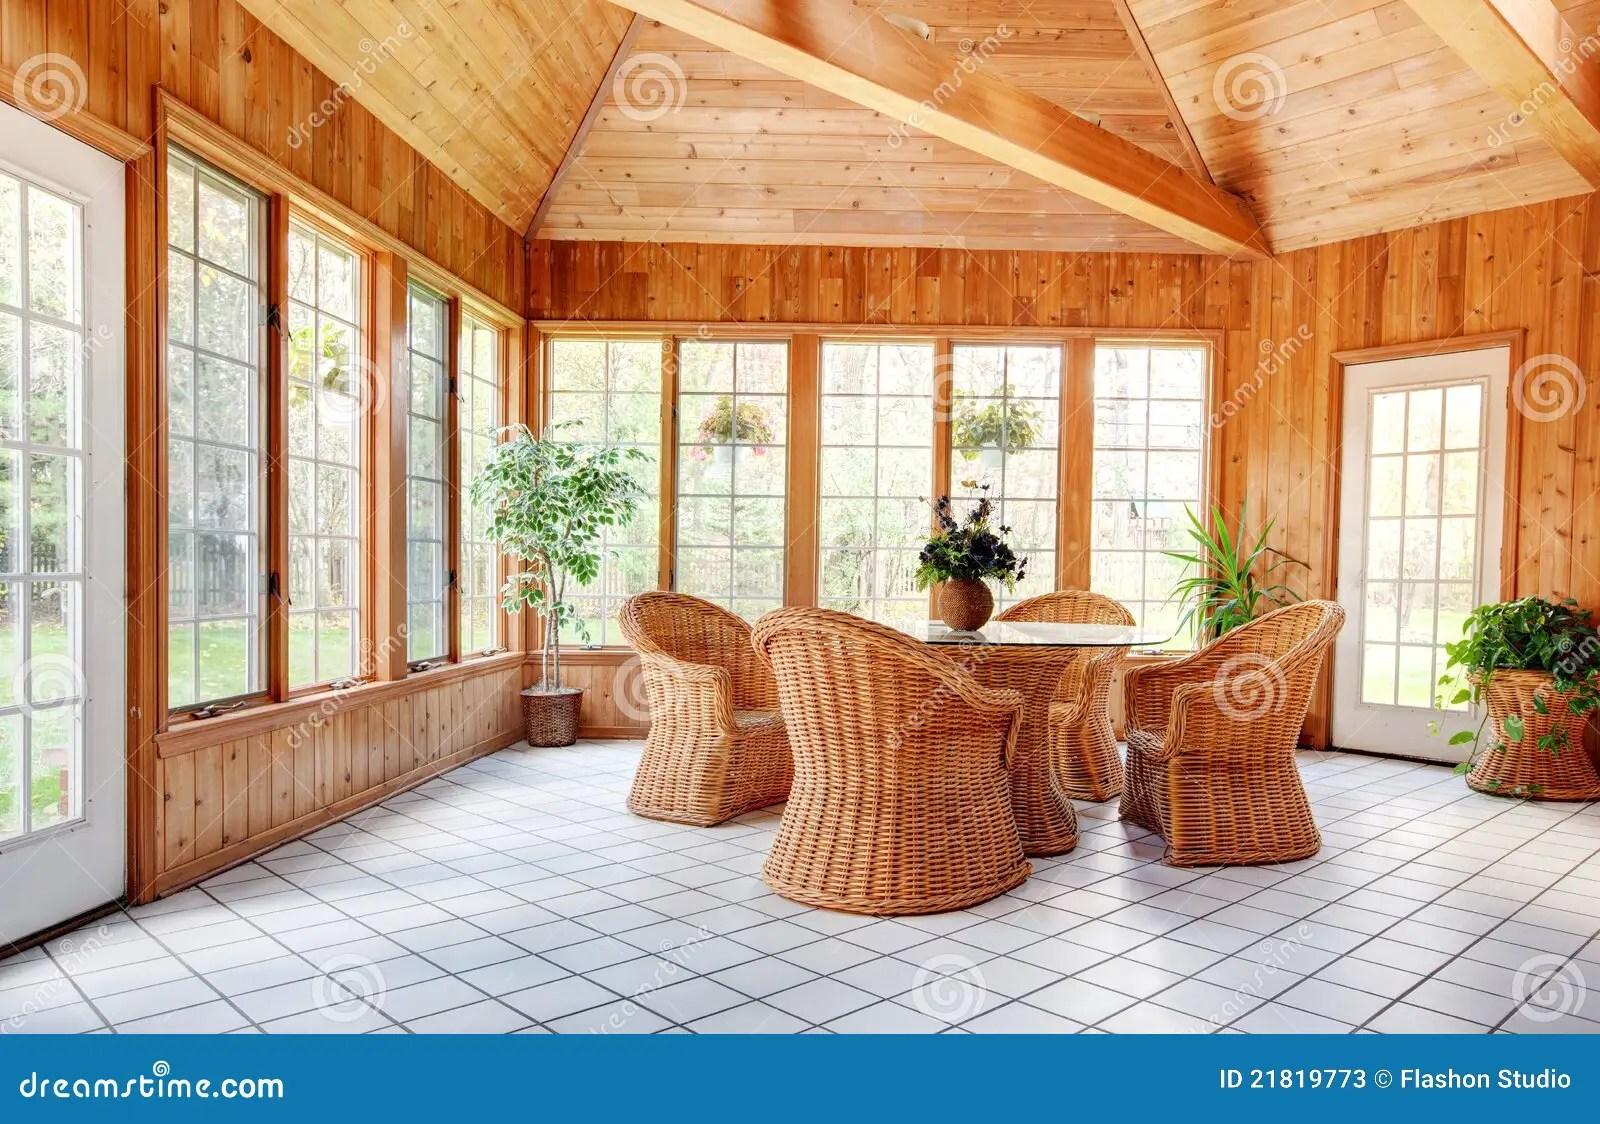 ceramic tile living room wall light gray paint wooden sun interior stock photos - image: 21819773